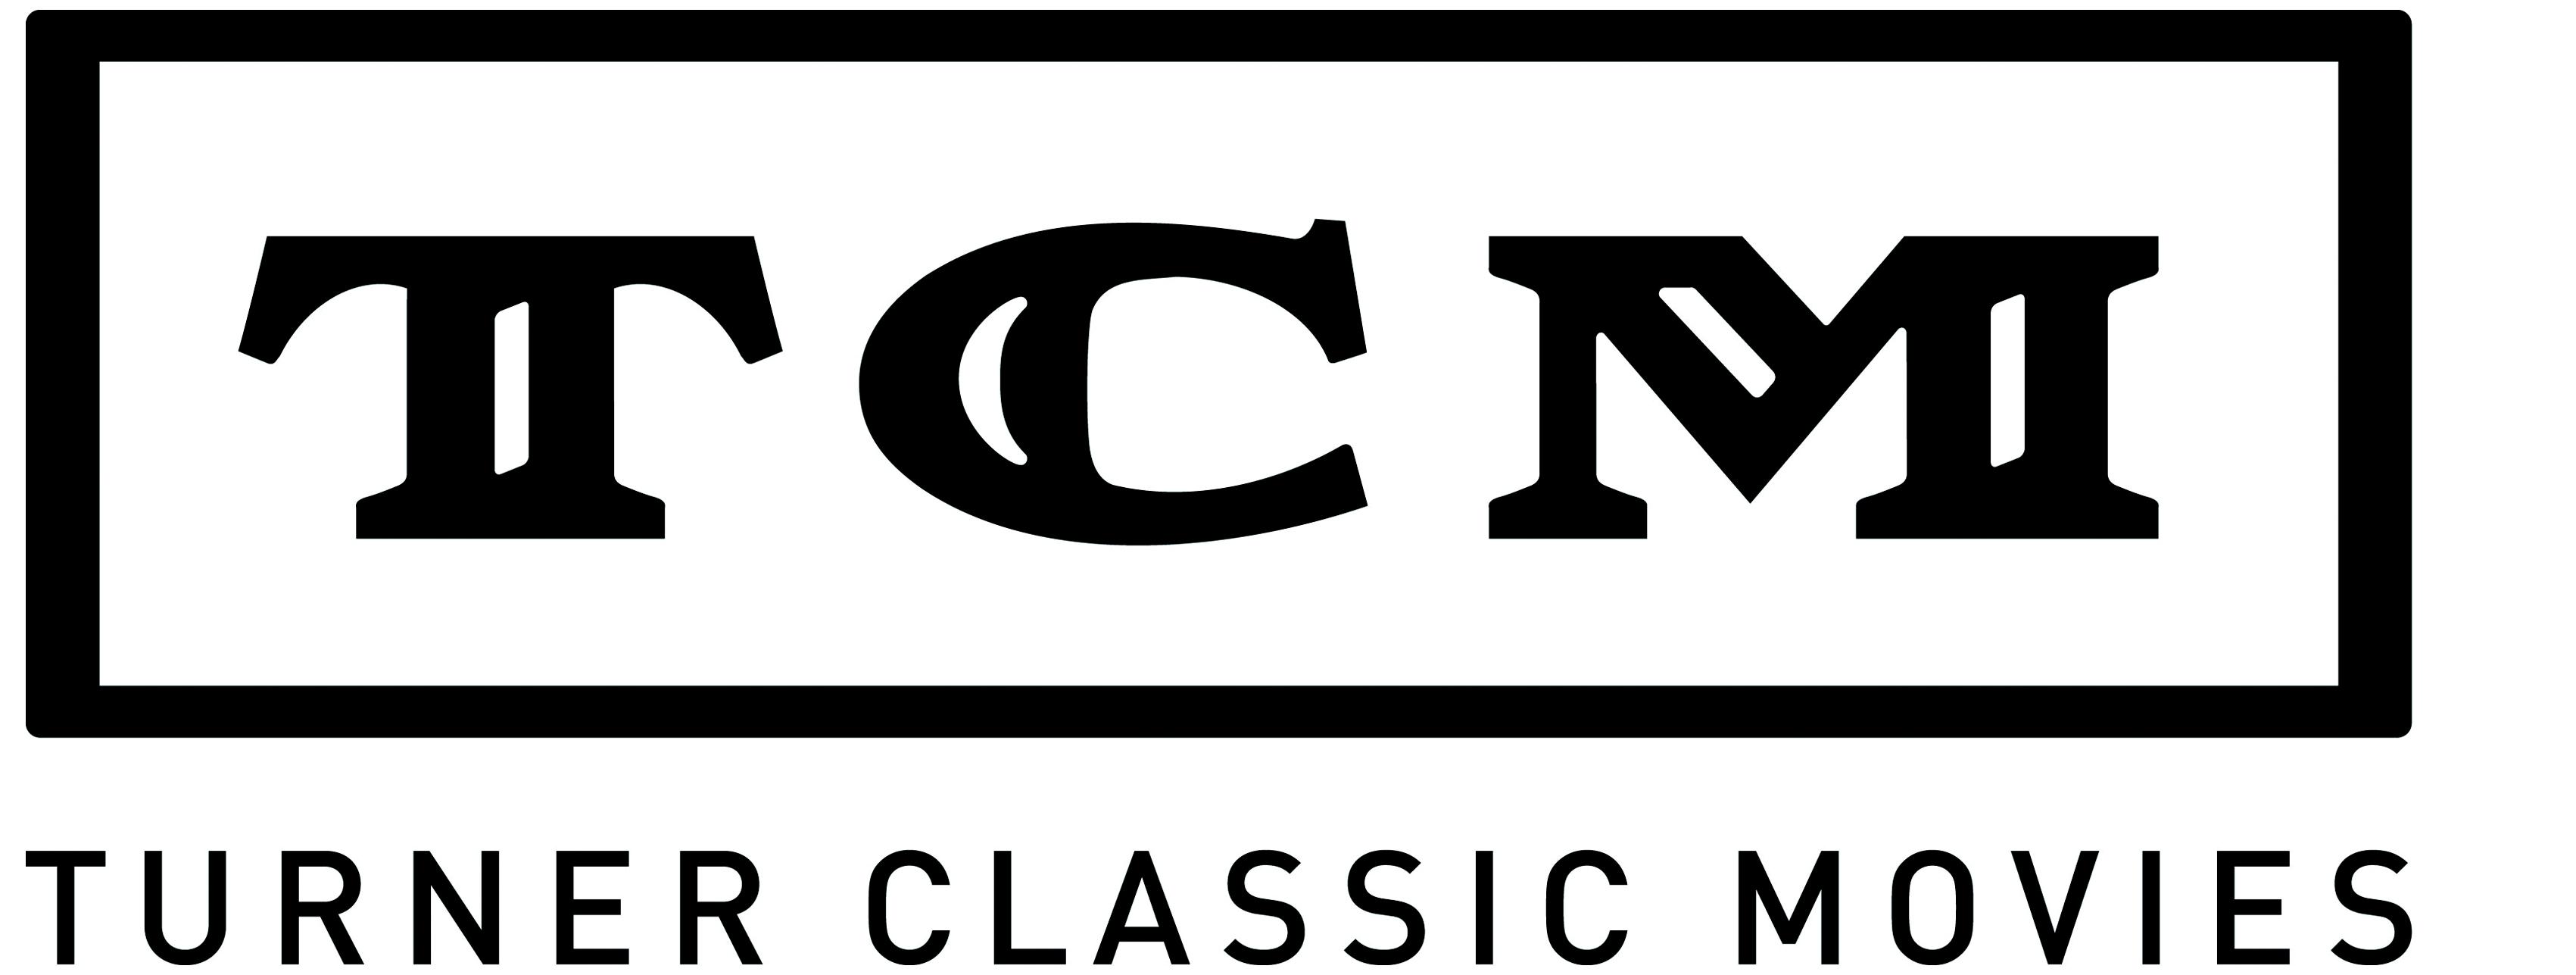 Turner Classic Movies